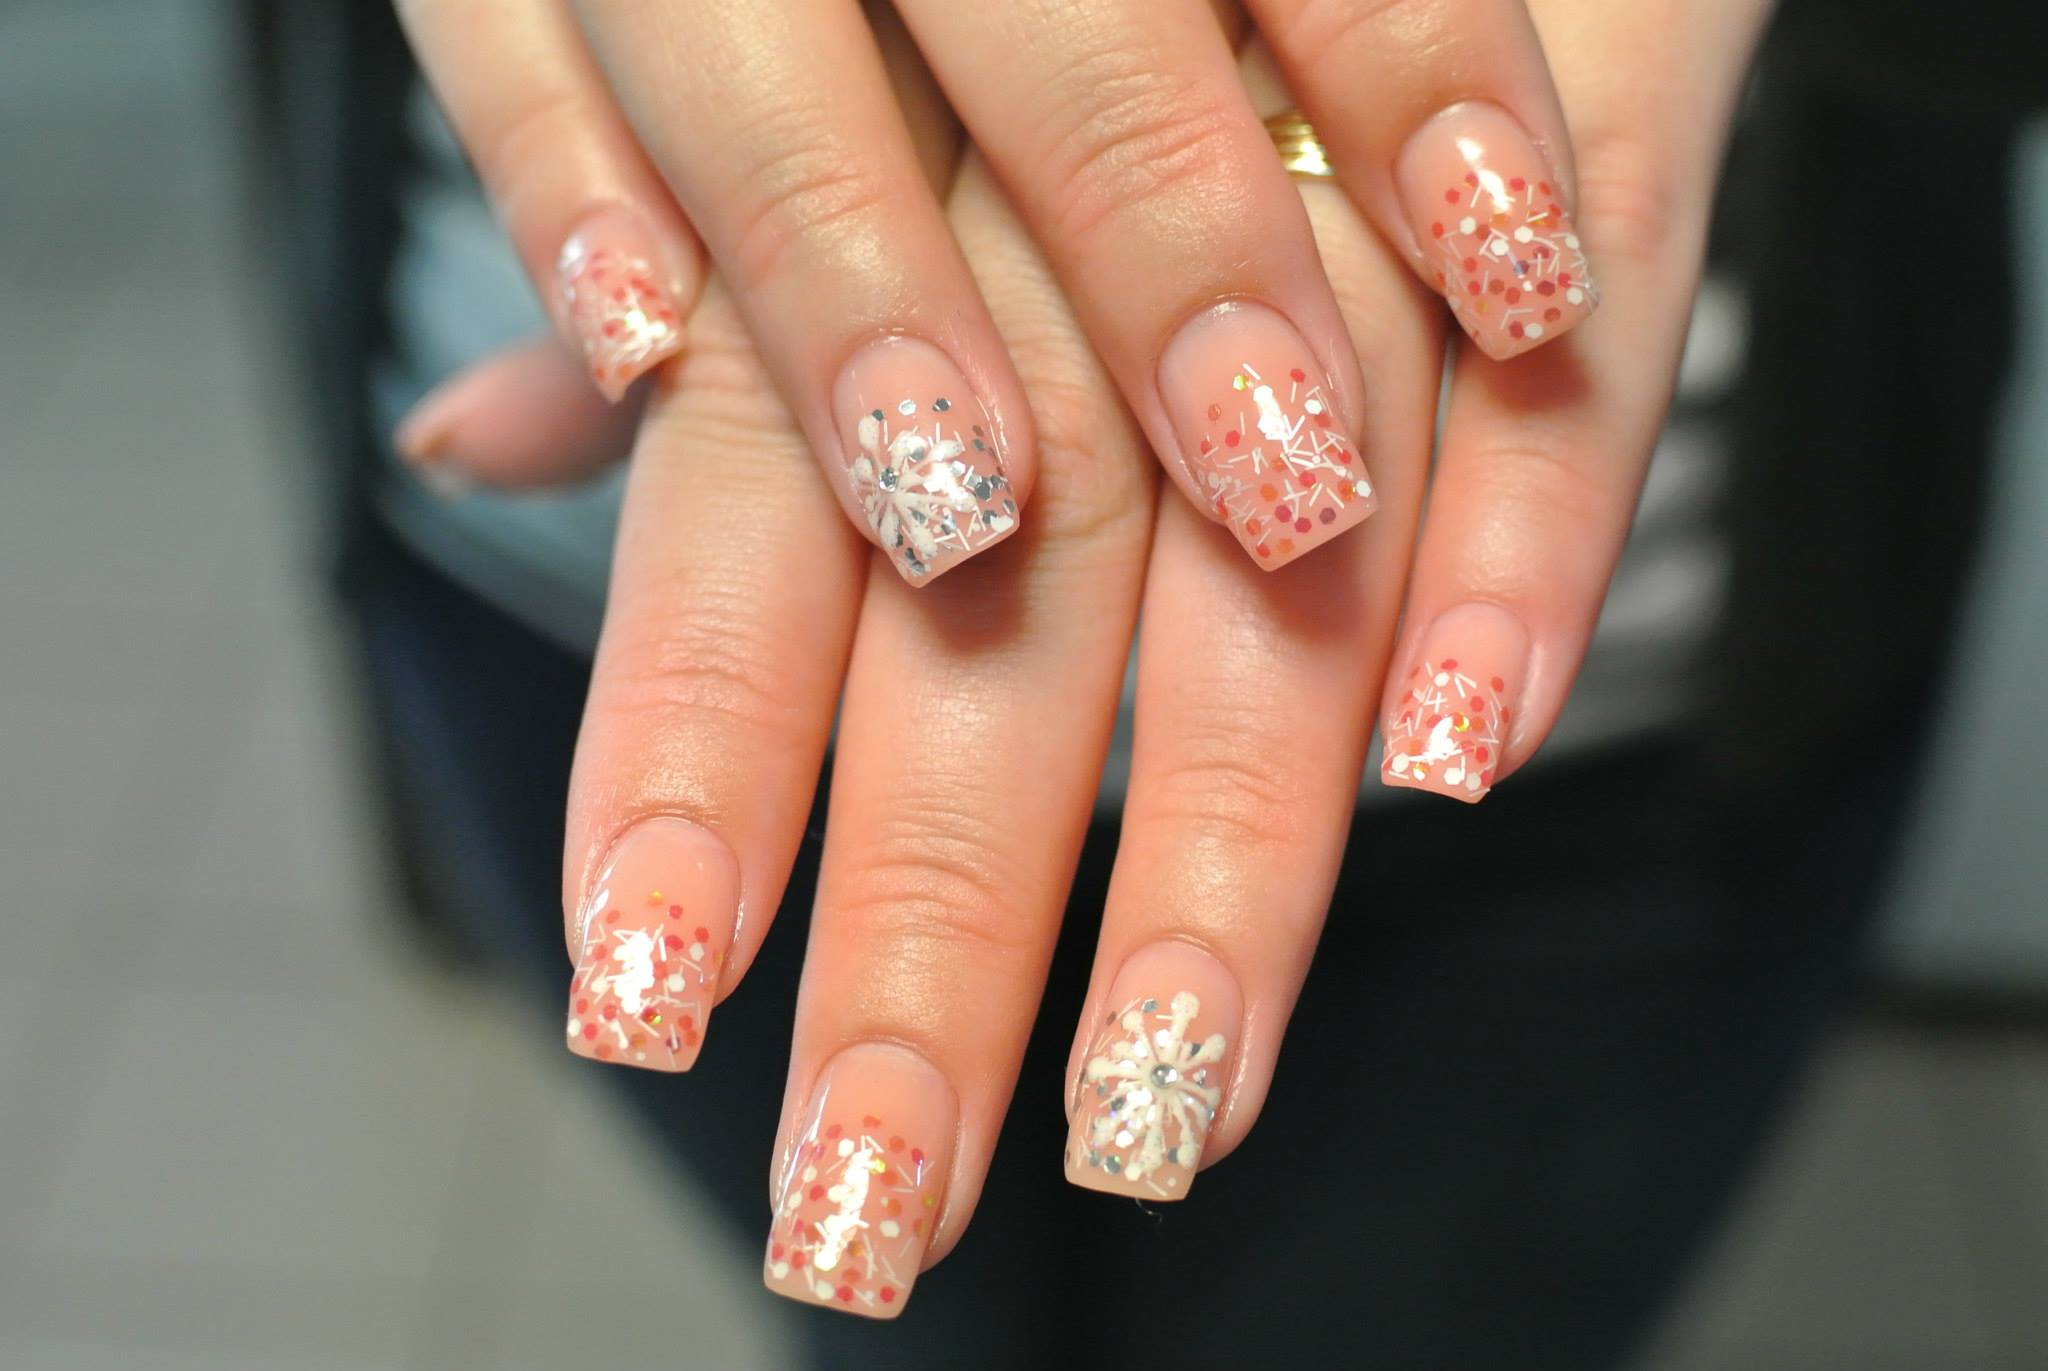 Manichiura Militari Unghii False Unghii Tehnice Nail Art